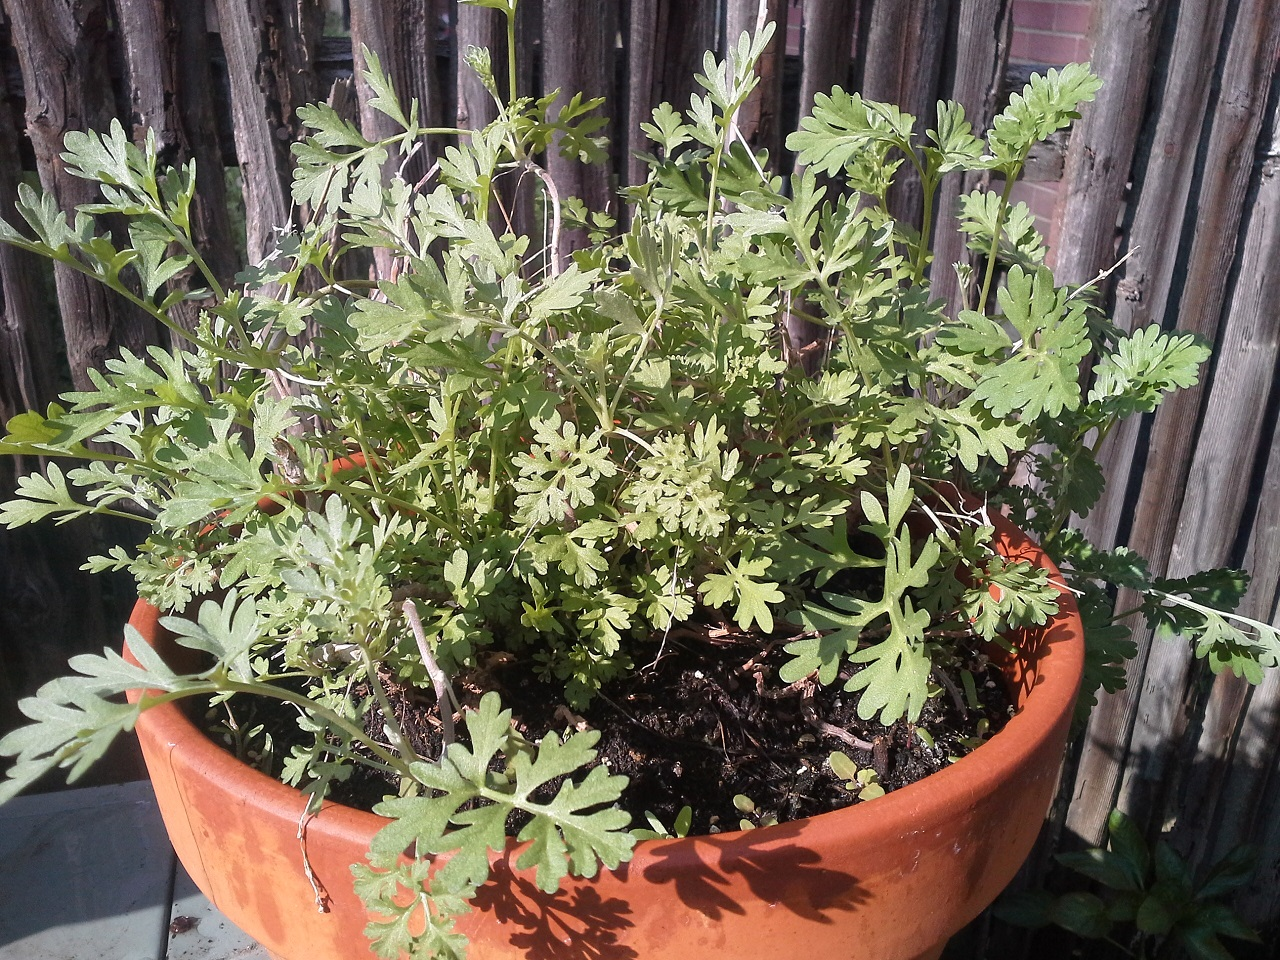 Planting a Cocktail Garden: Consider Perennials